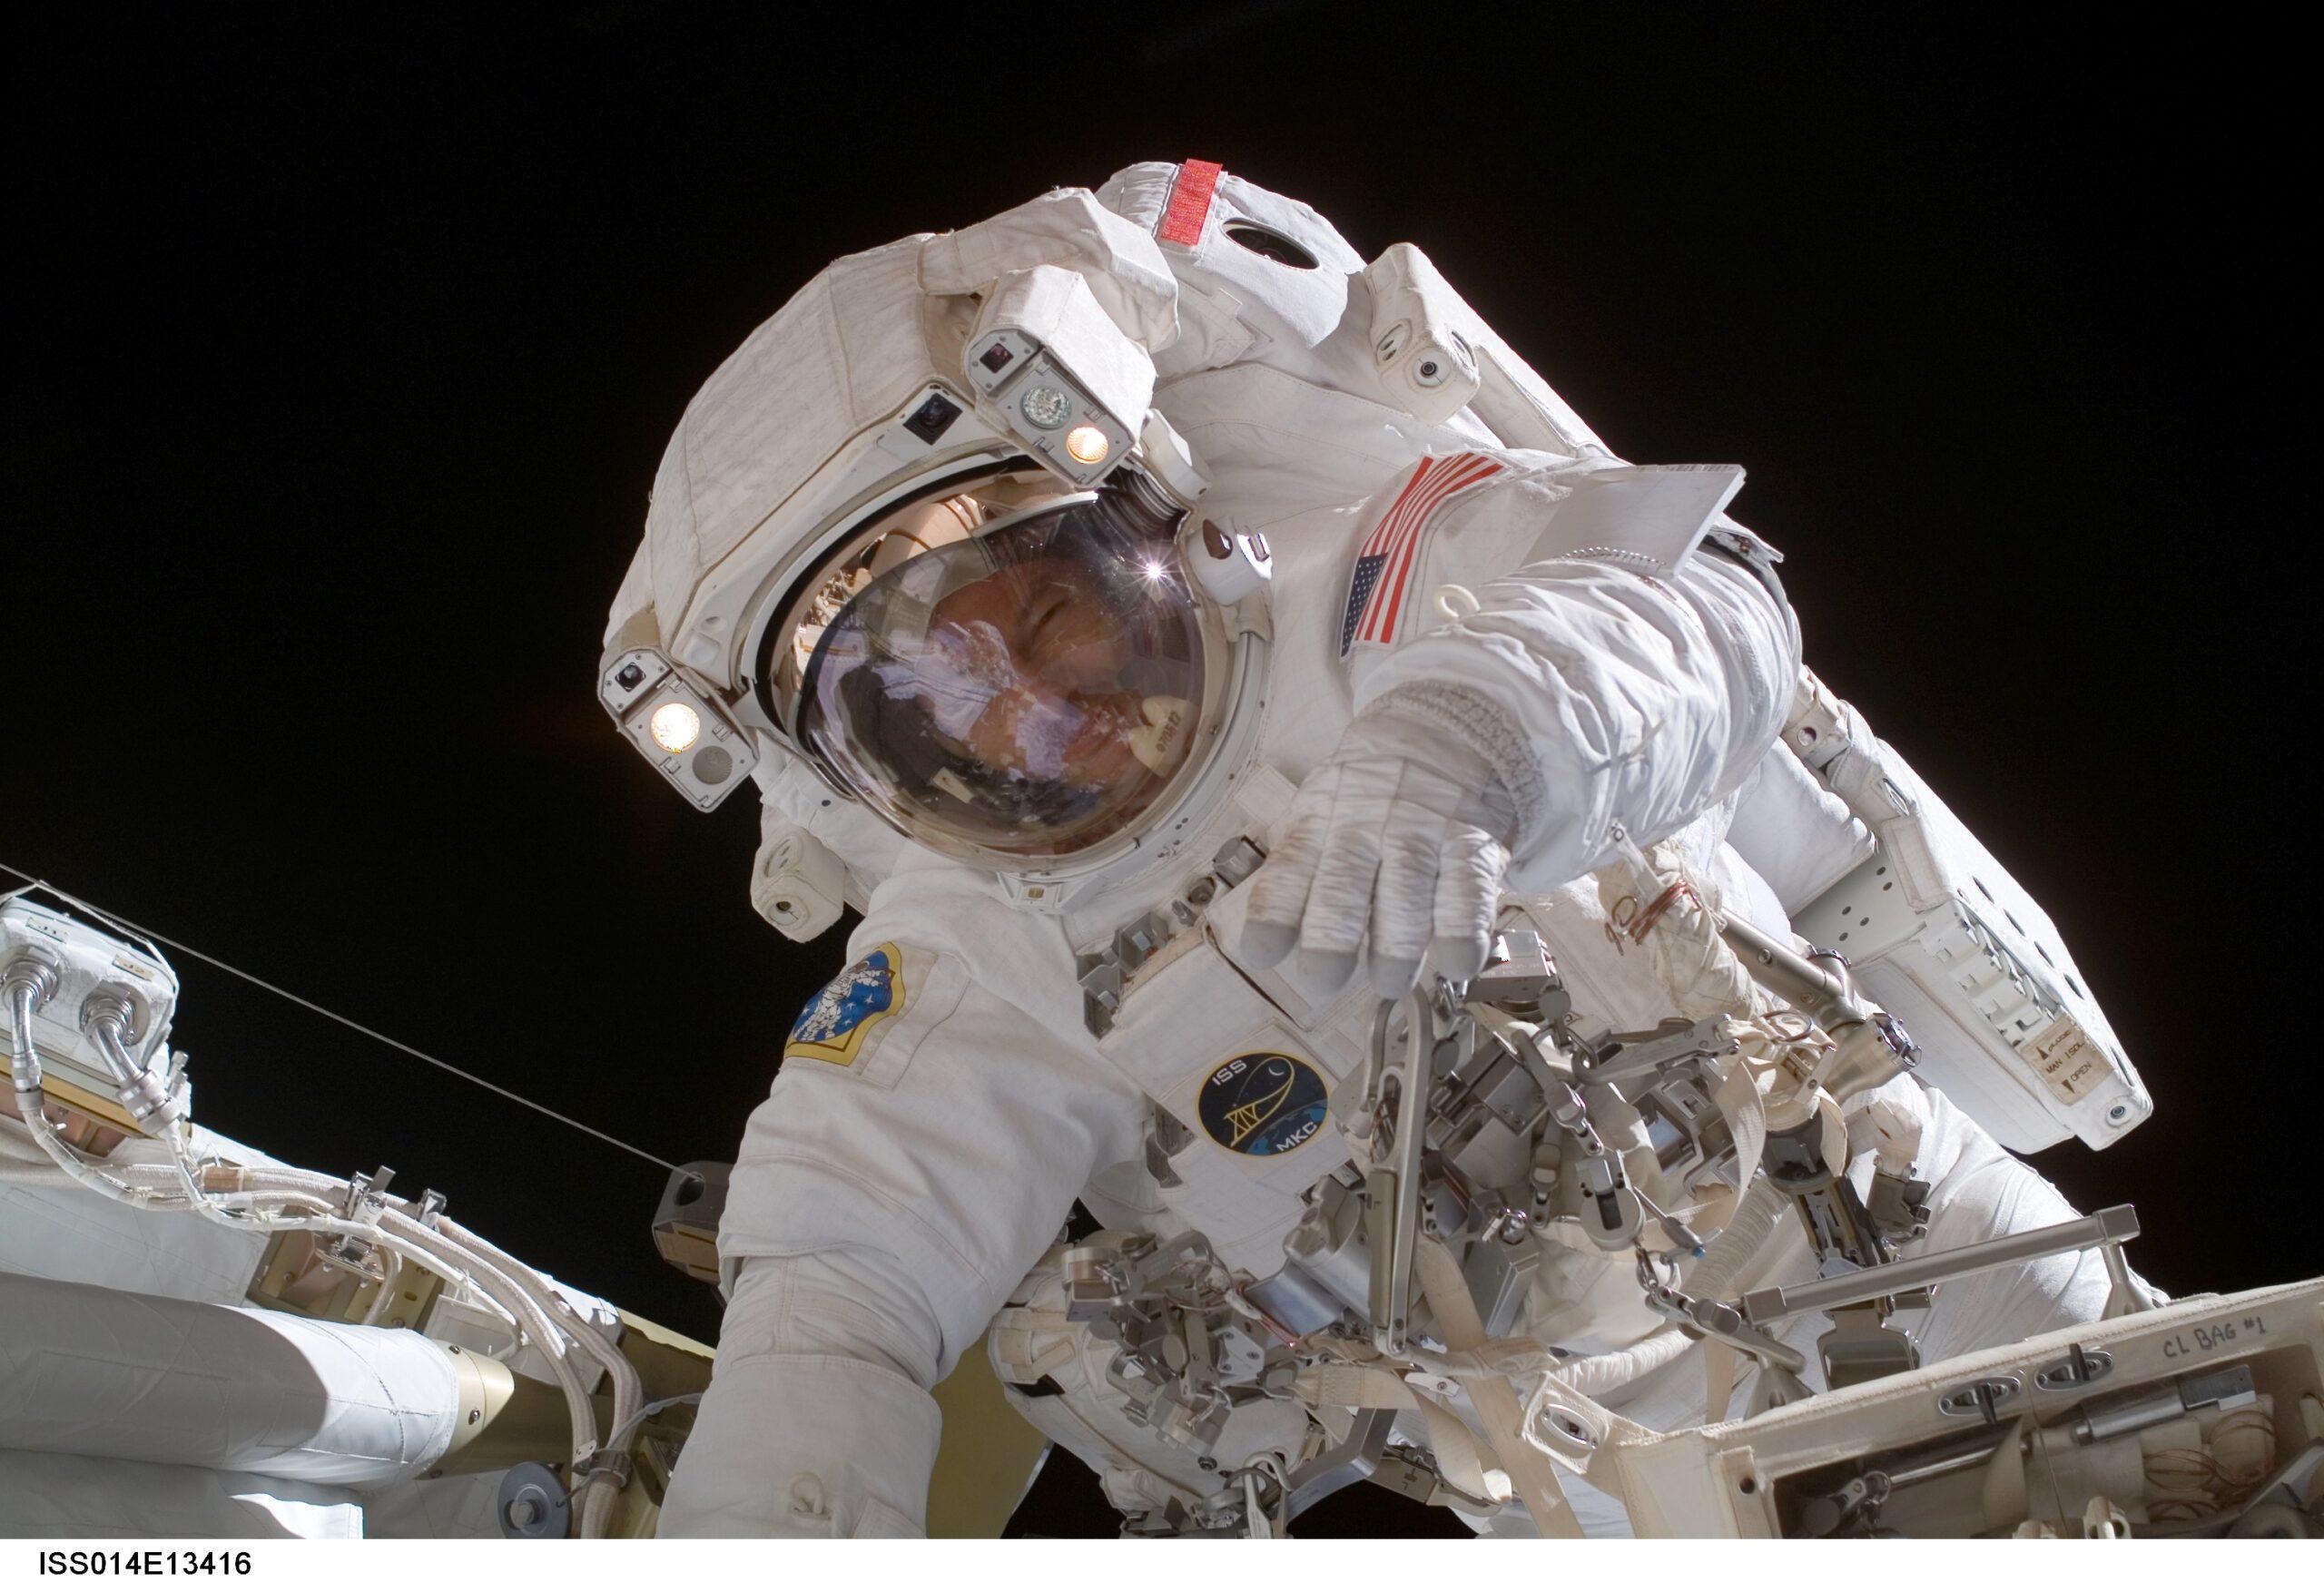 Michael lopez alegria astronauta